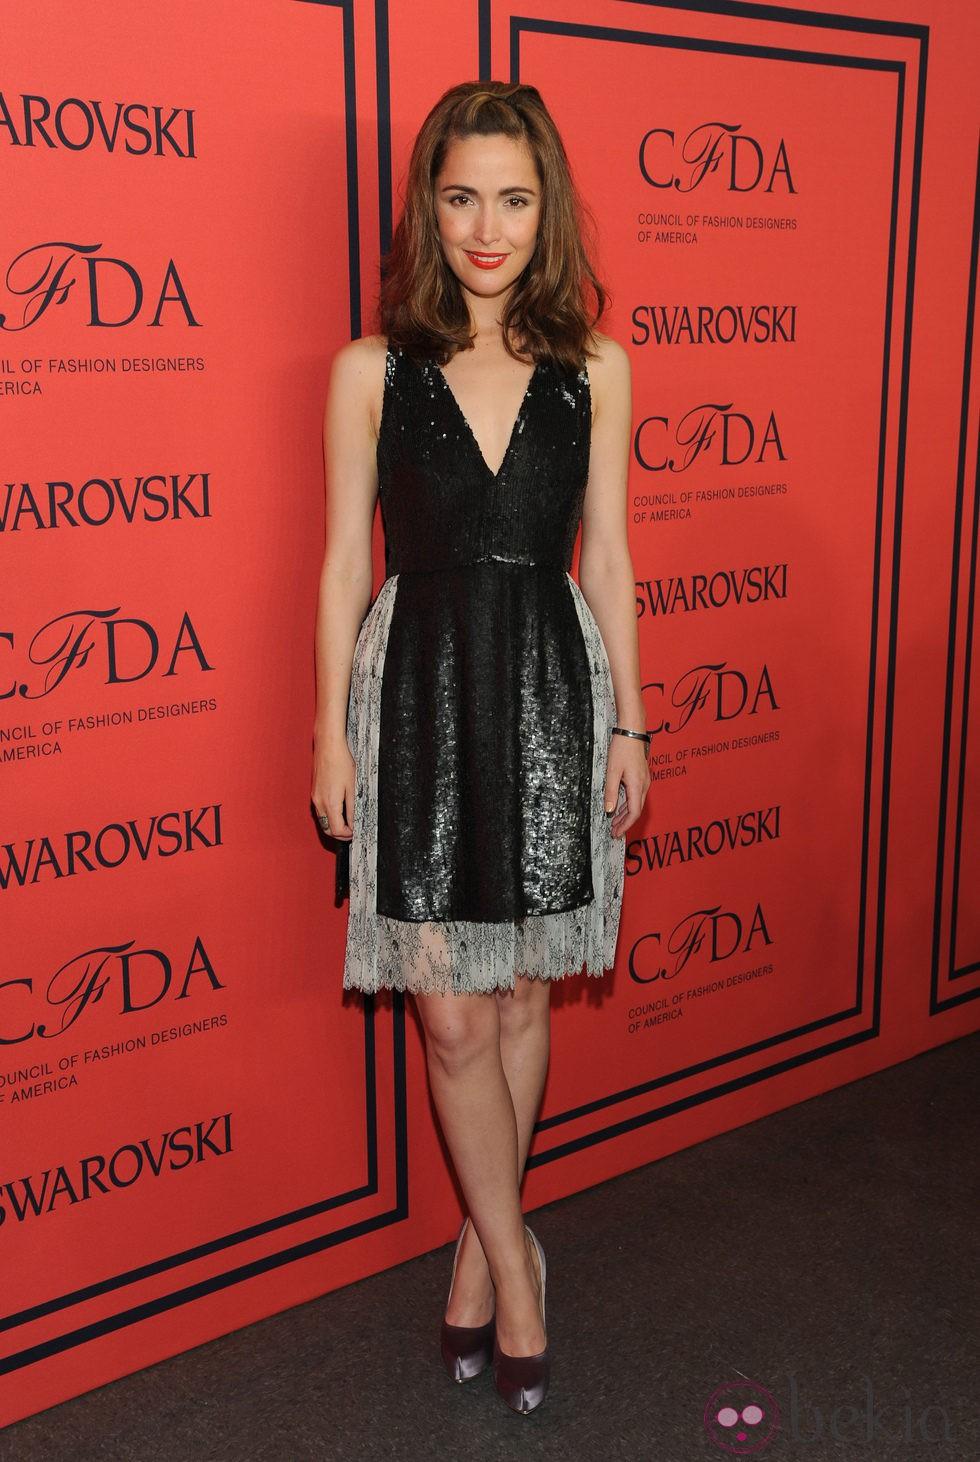 Rose Byrne en los Premios CFDA 2013